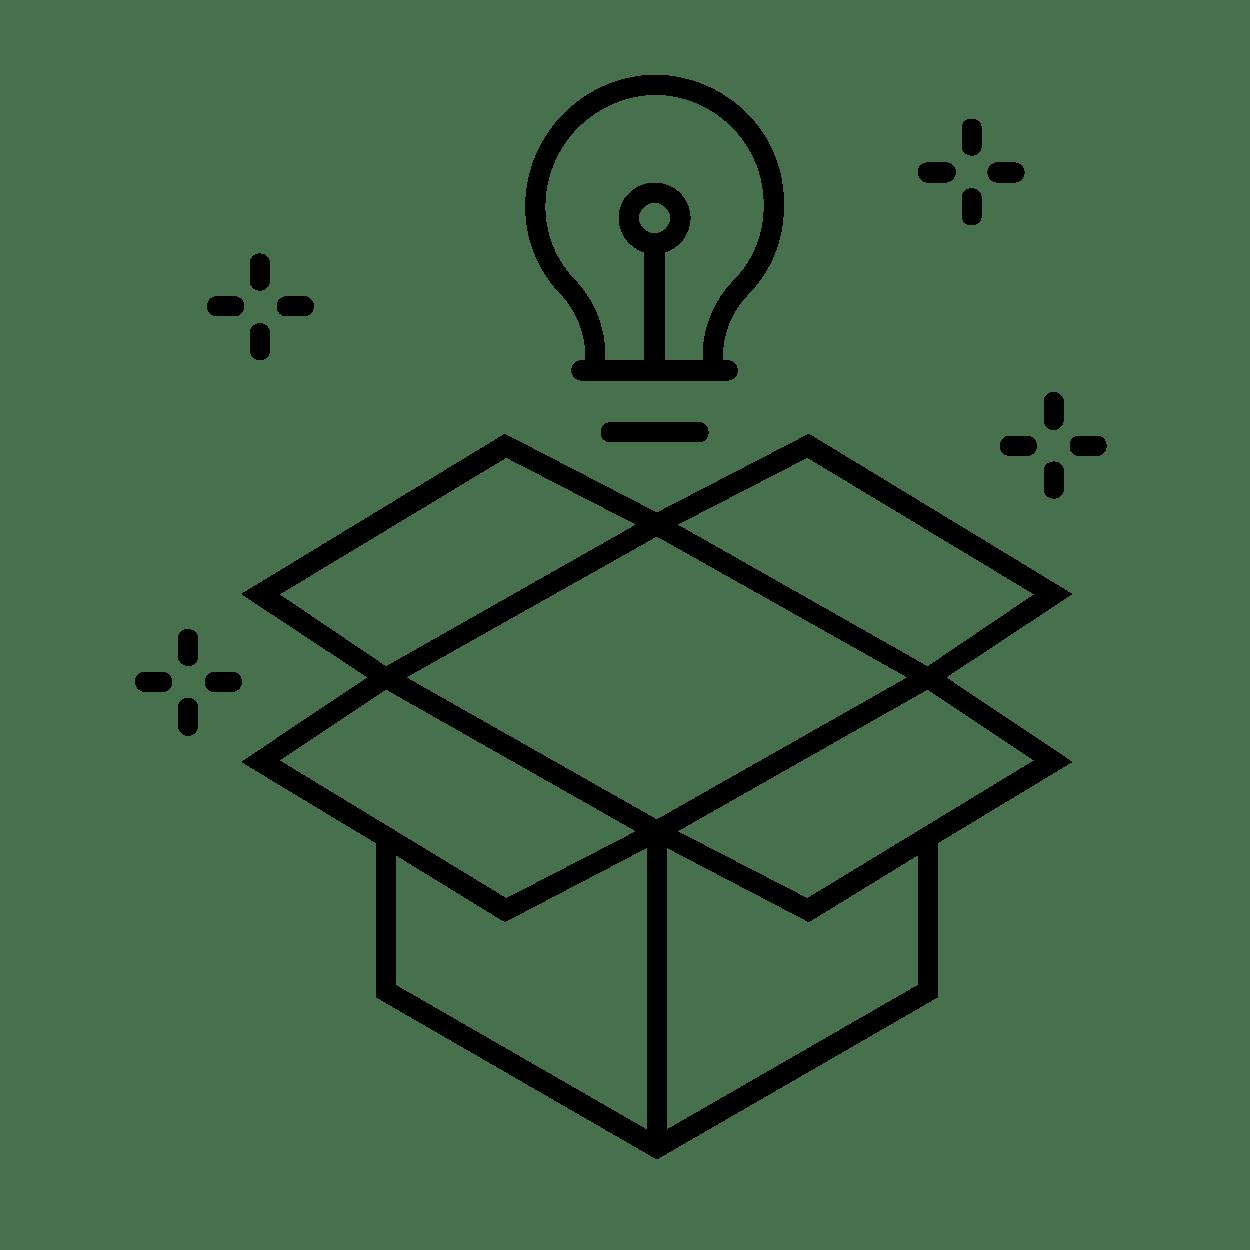 https://www.itu.int/net4/wsis/forum/2018/Content/img/logos/hackathon/ideabox-01-01-min.png